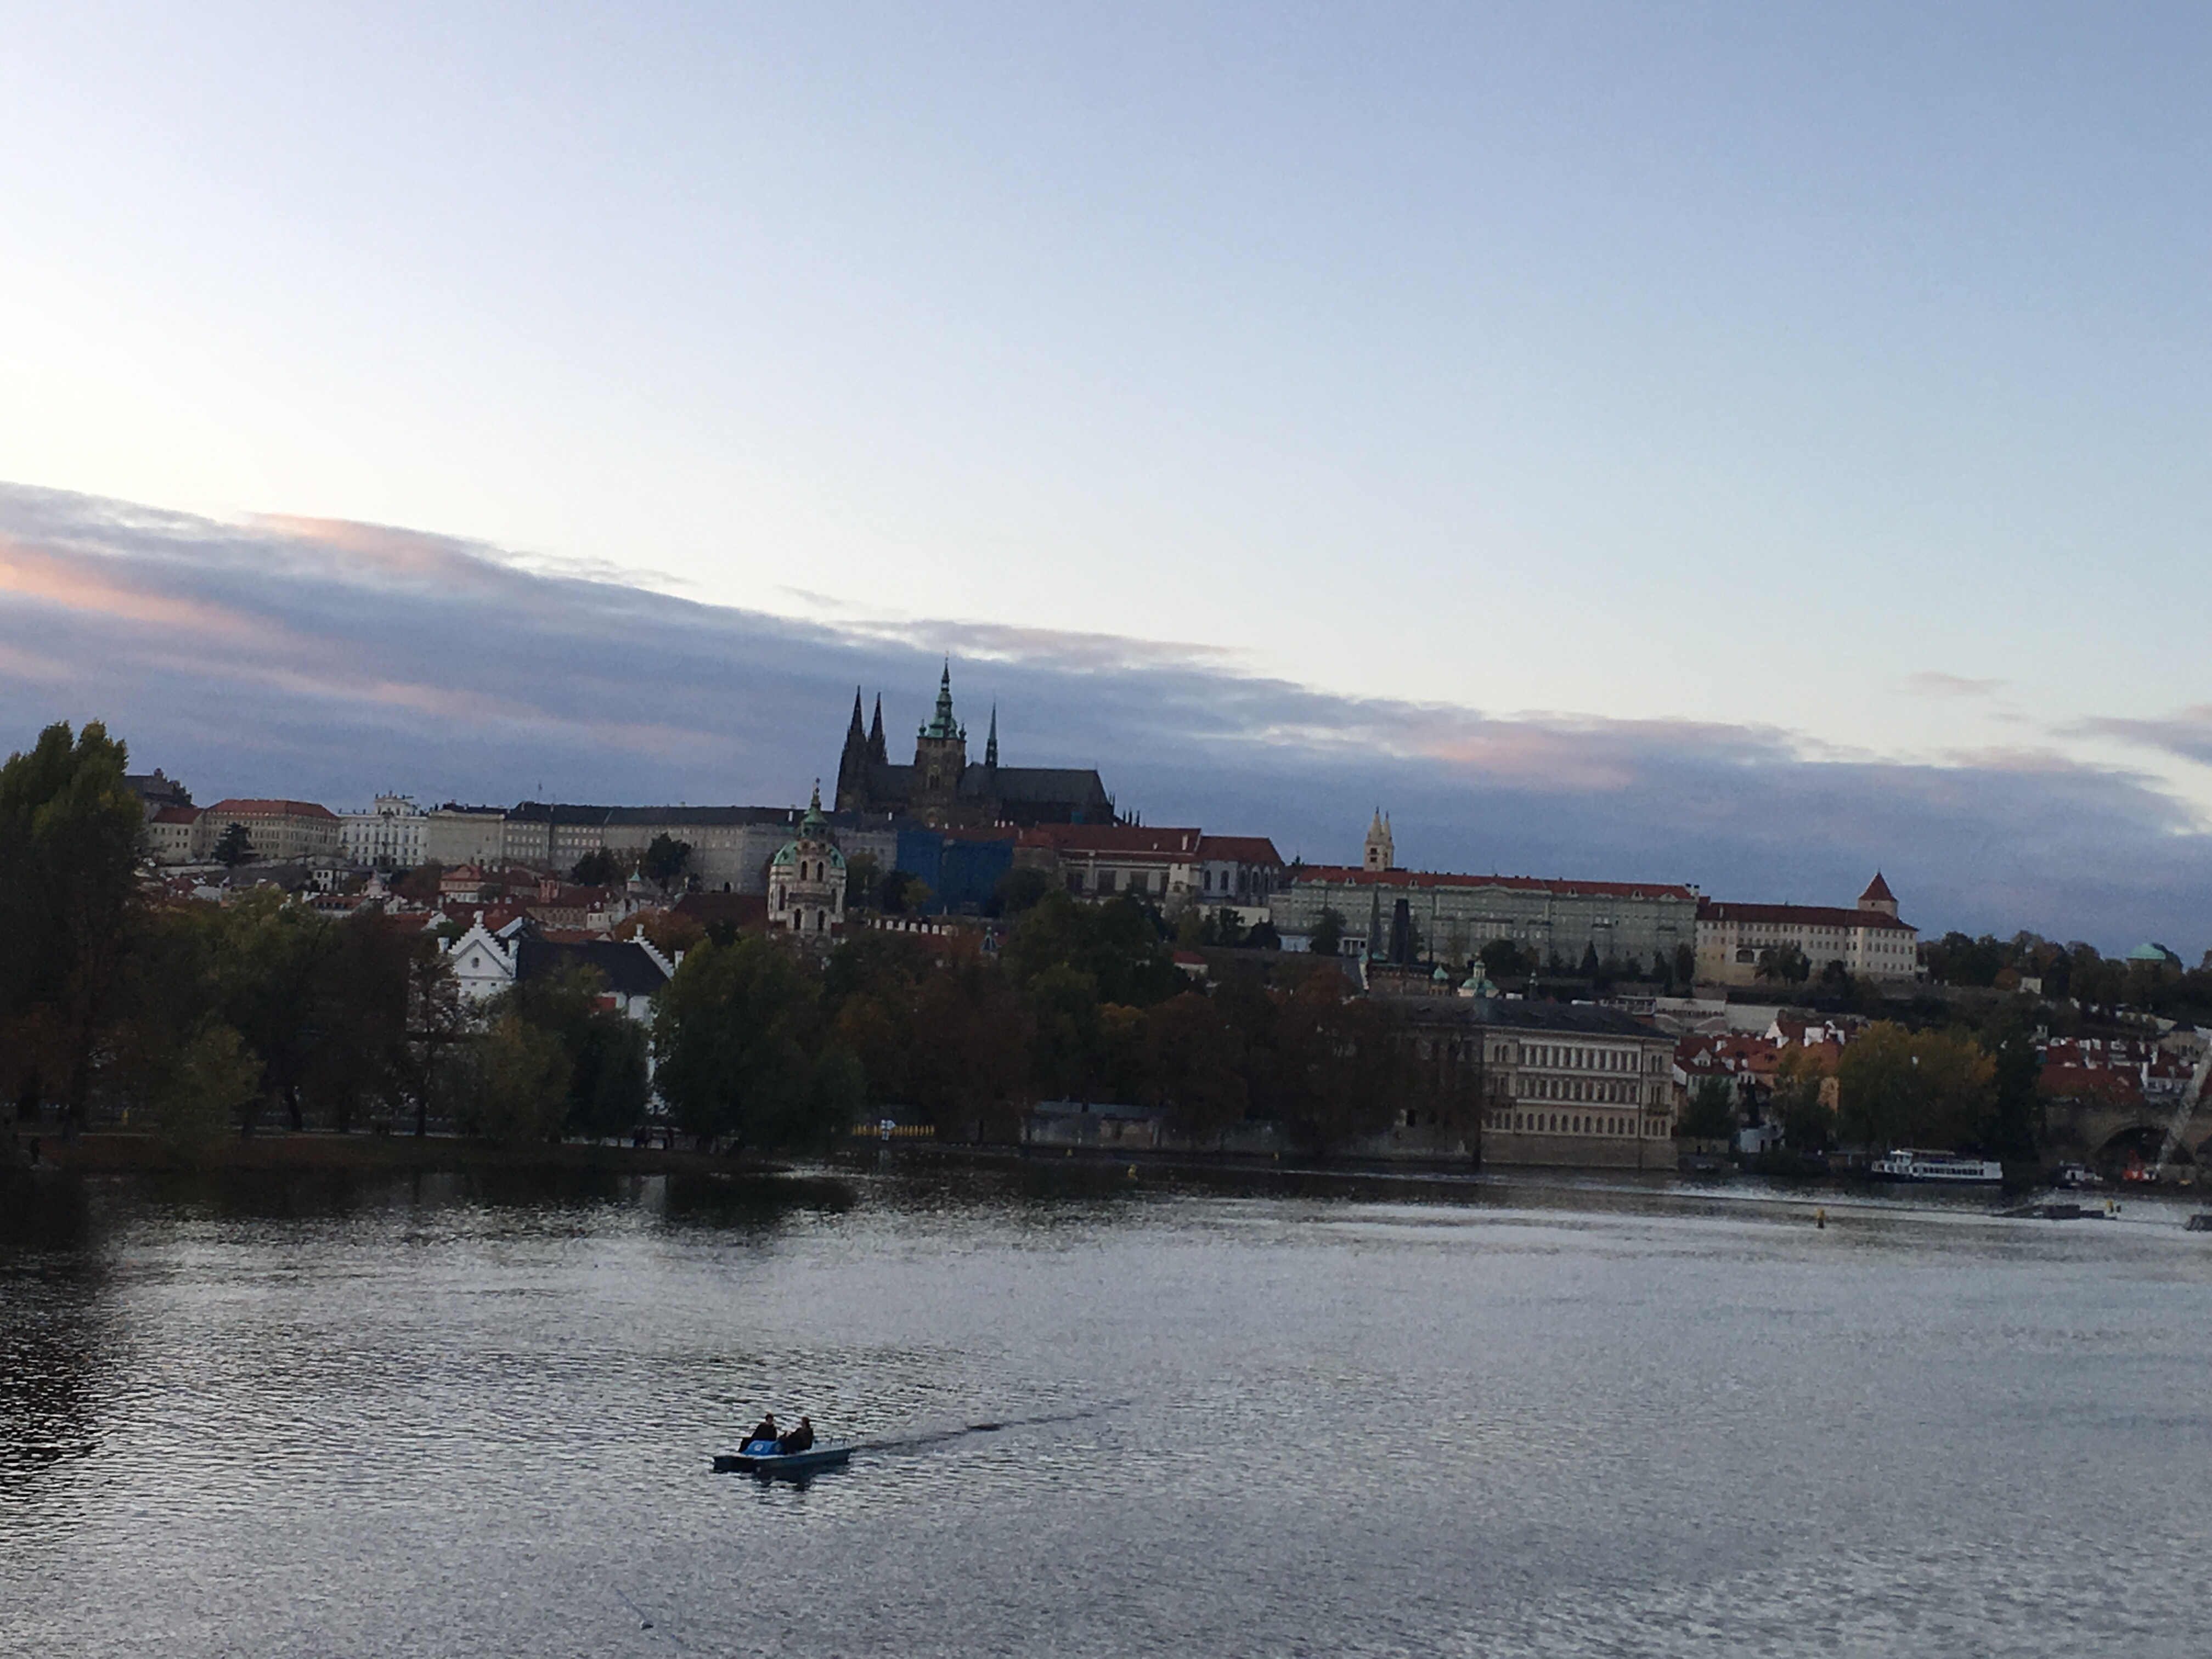 Prague Castle & River Vltava, October 2019